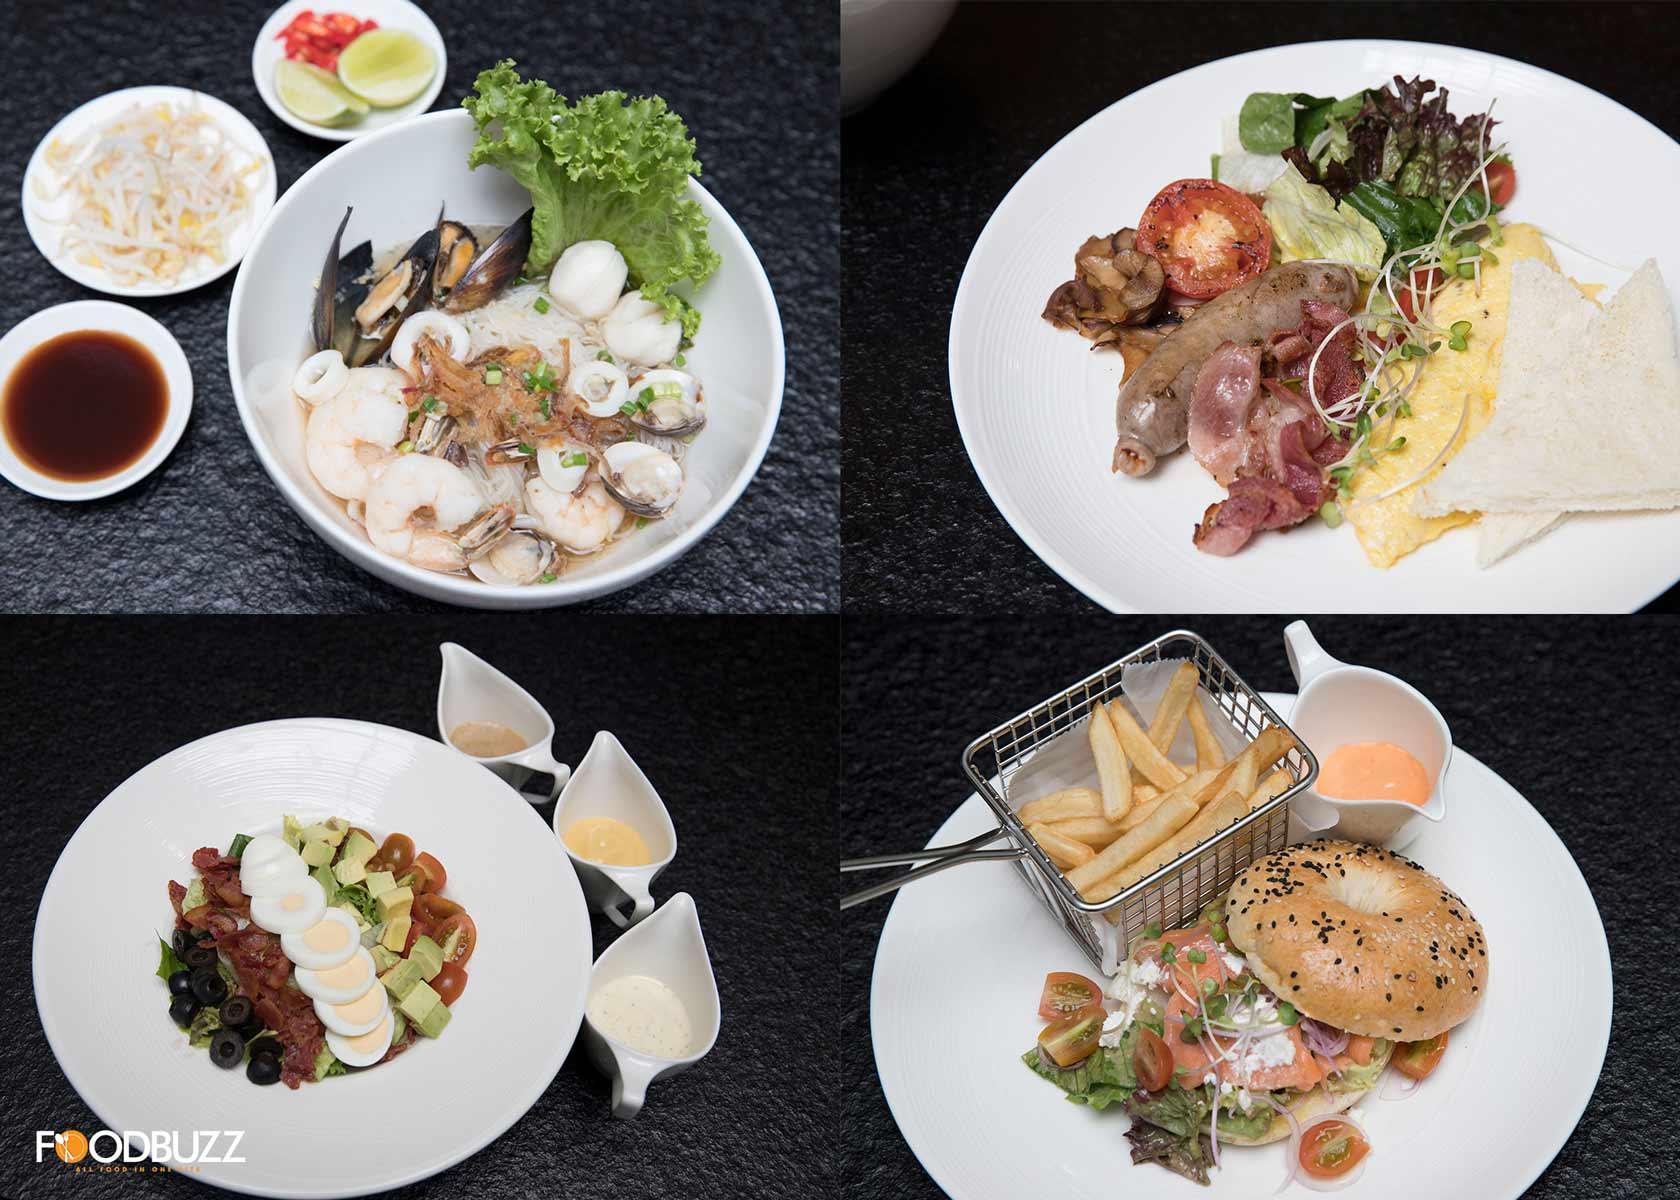 {:kh}ធ្វើឲ្យ Date របស់អ្នកកាន់តែមានន័យជាមួយនឹងអាហារ និងបរិយាកាសយ៉ាងប្រណីតនៅអារម្មណ៍{:}{:en}Luxuriate in Ambience and Great Dishes at Arom Restaurant{:}